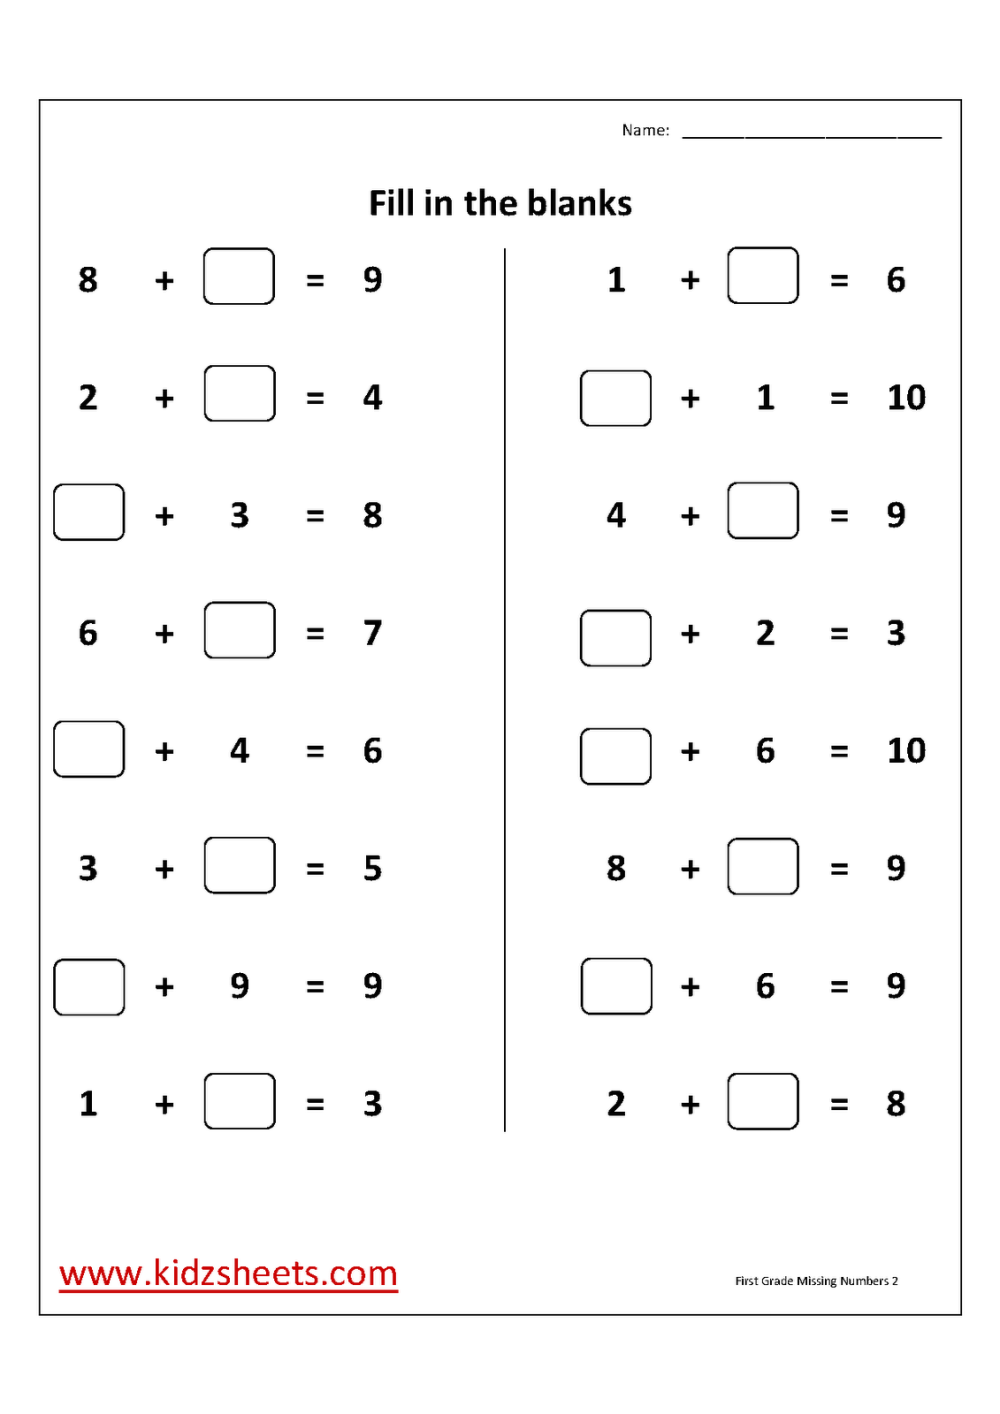 medium resolution of 11 Best 1st Grade Morning Work Worksheets images on Best Worksheets  Collection